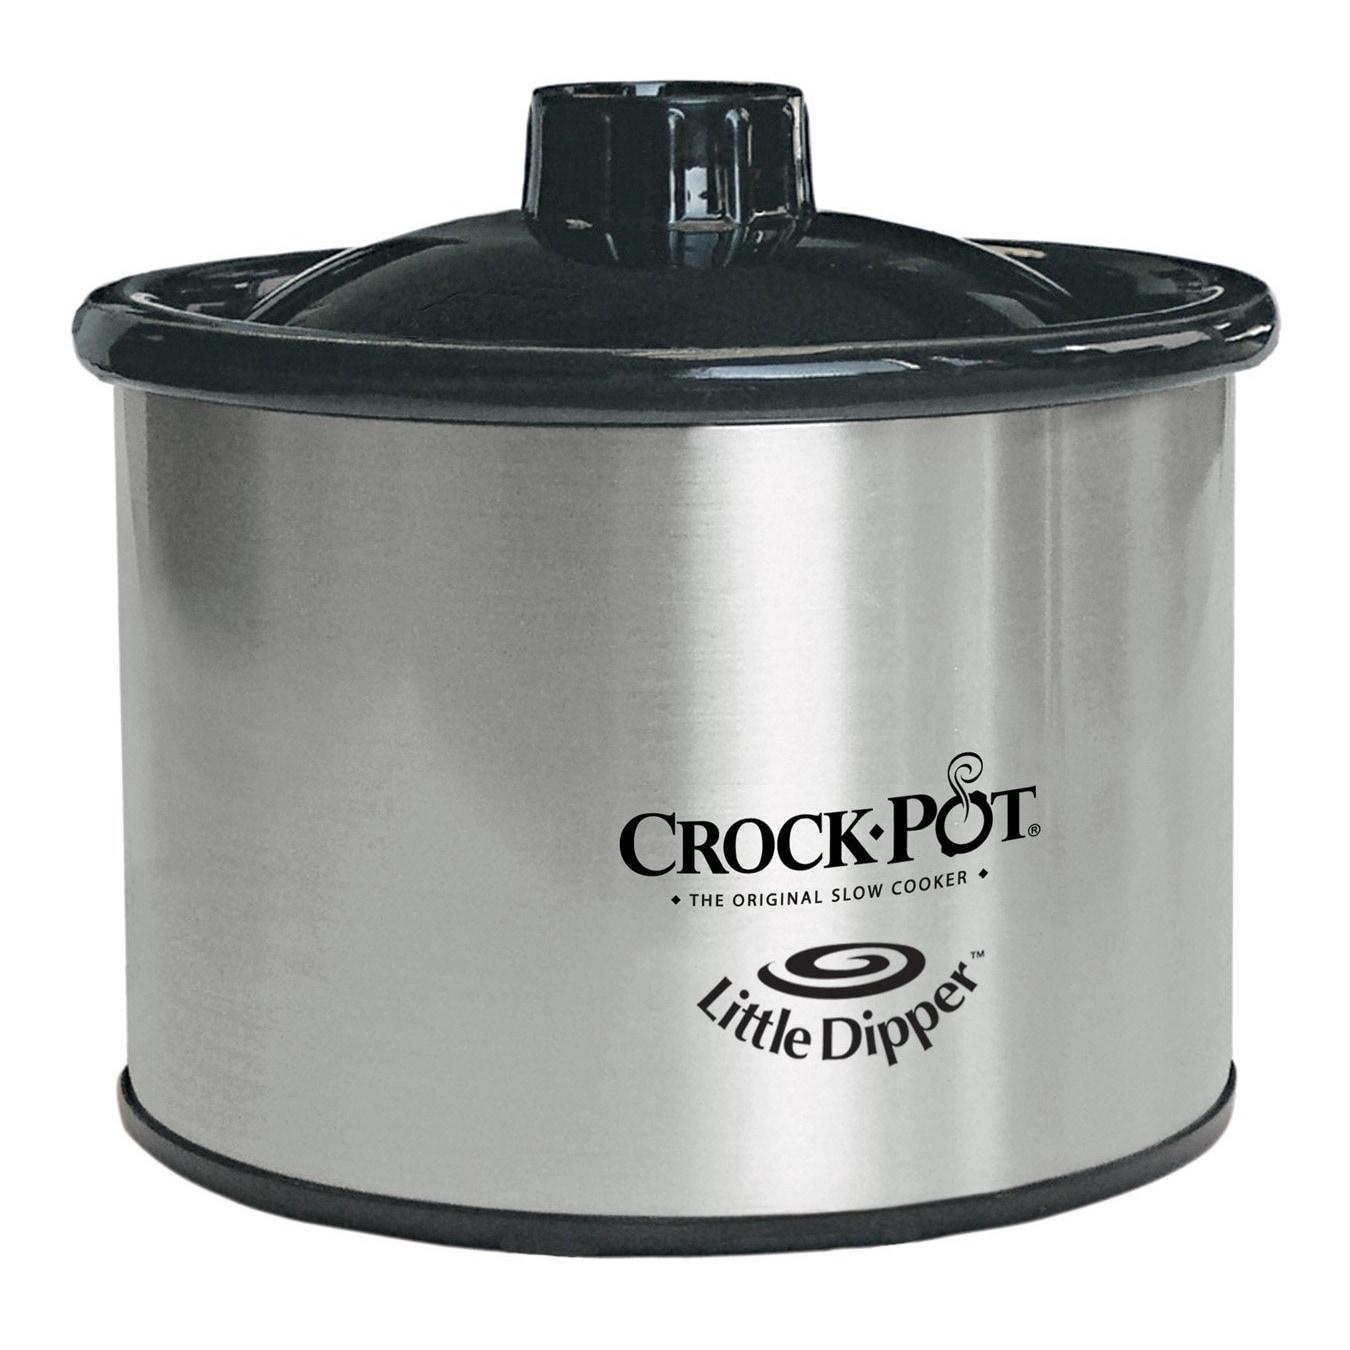 Rival 32041-C Little Dipper Slow Cooker, Grey chrome